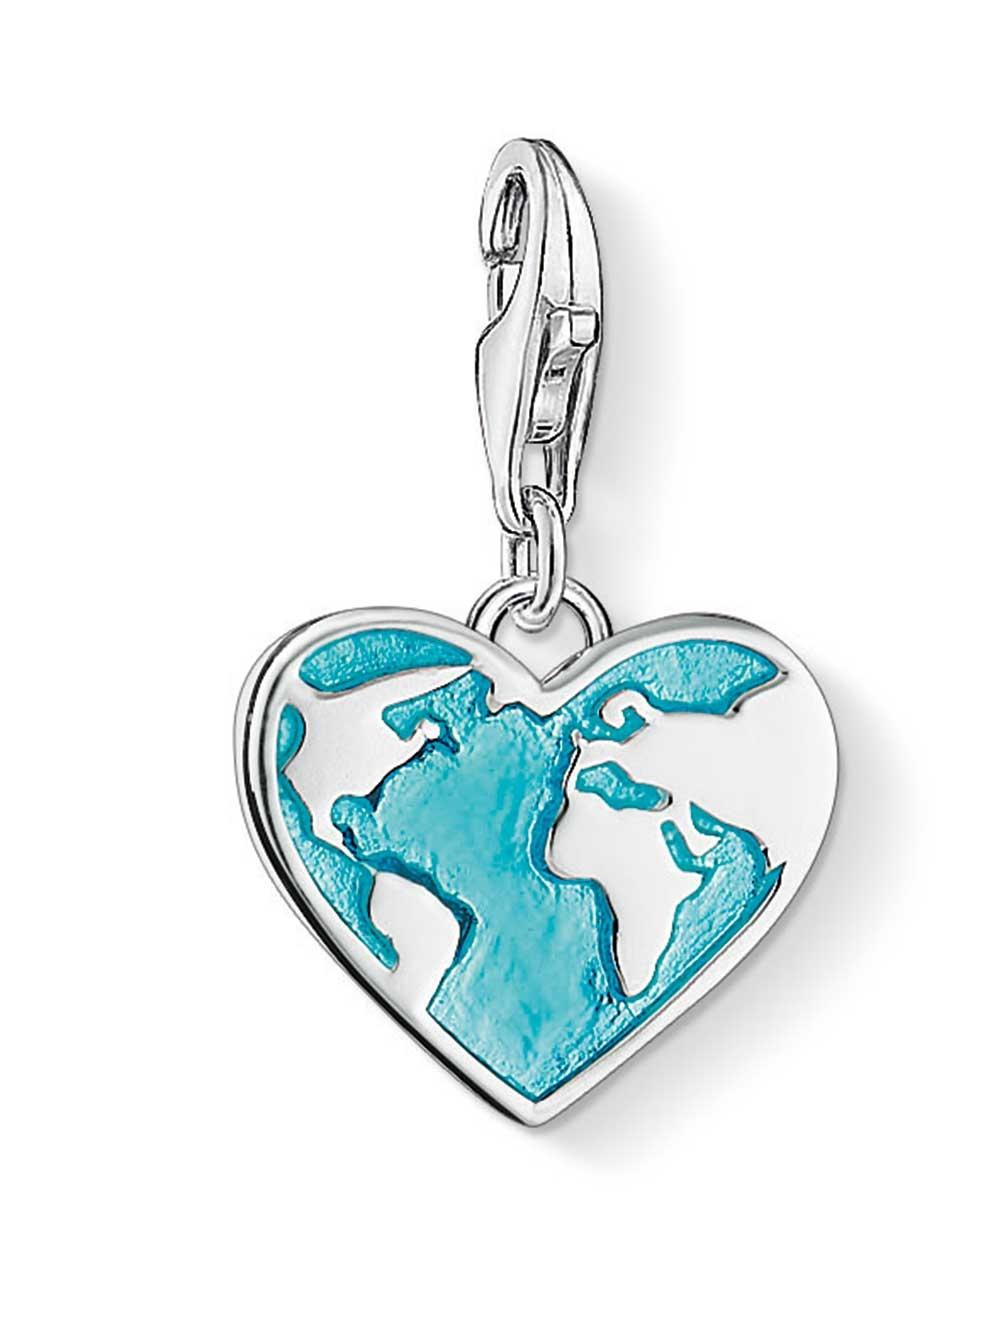 Thomas Sabo 1429-007-17 Charm Anhänger Herz Weltkarte